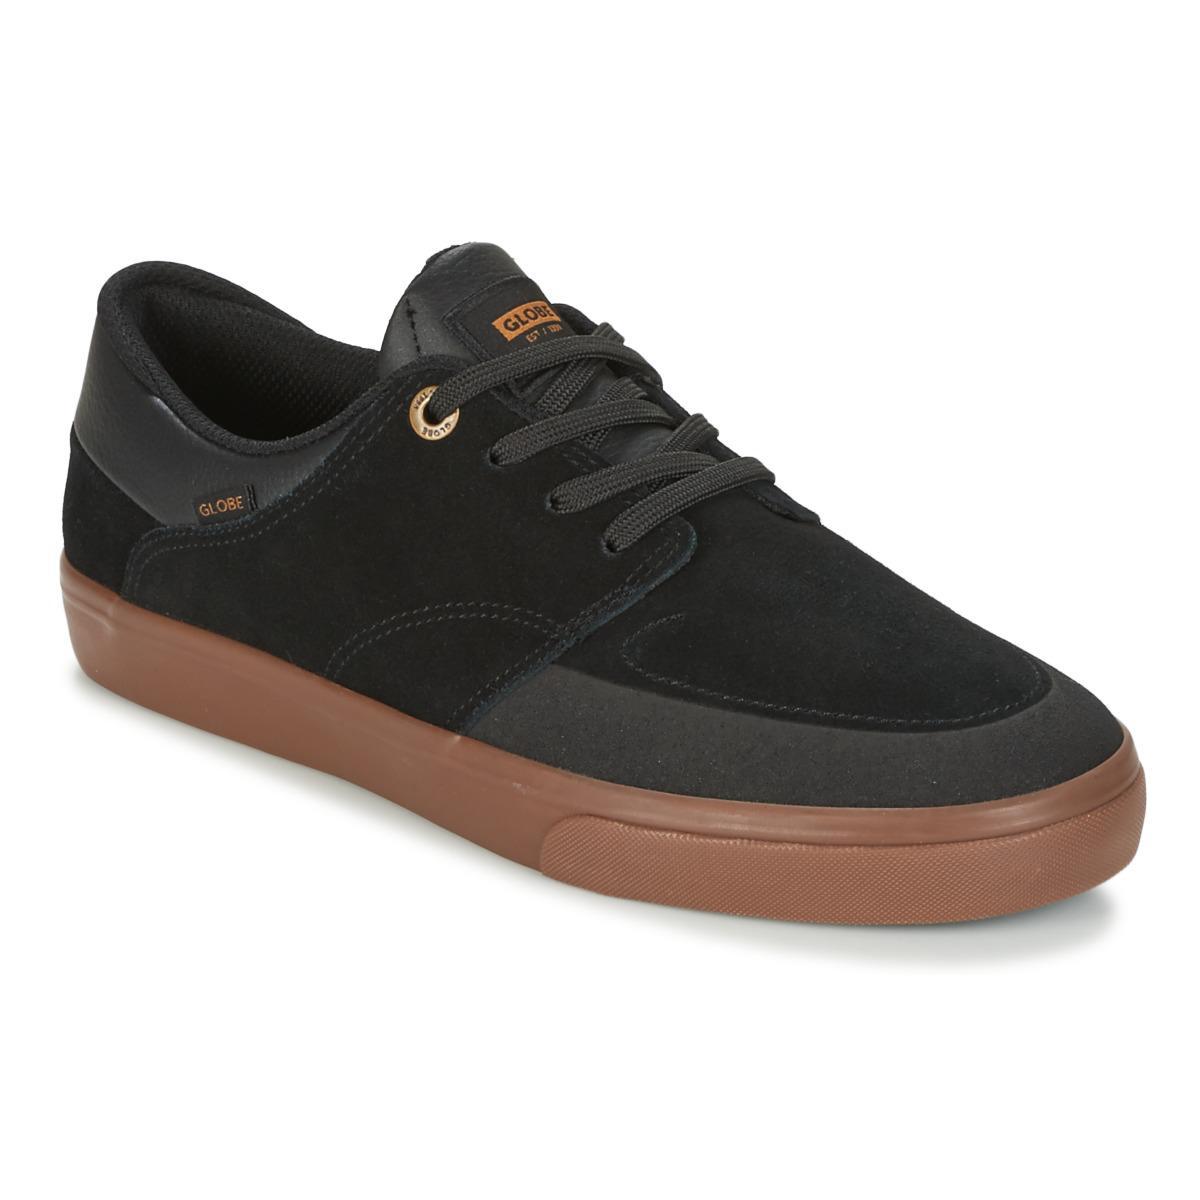 Nike Total 90 Laser III K FG grau Gr.40: : Schuhe